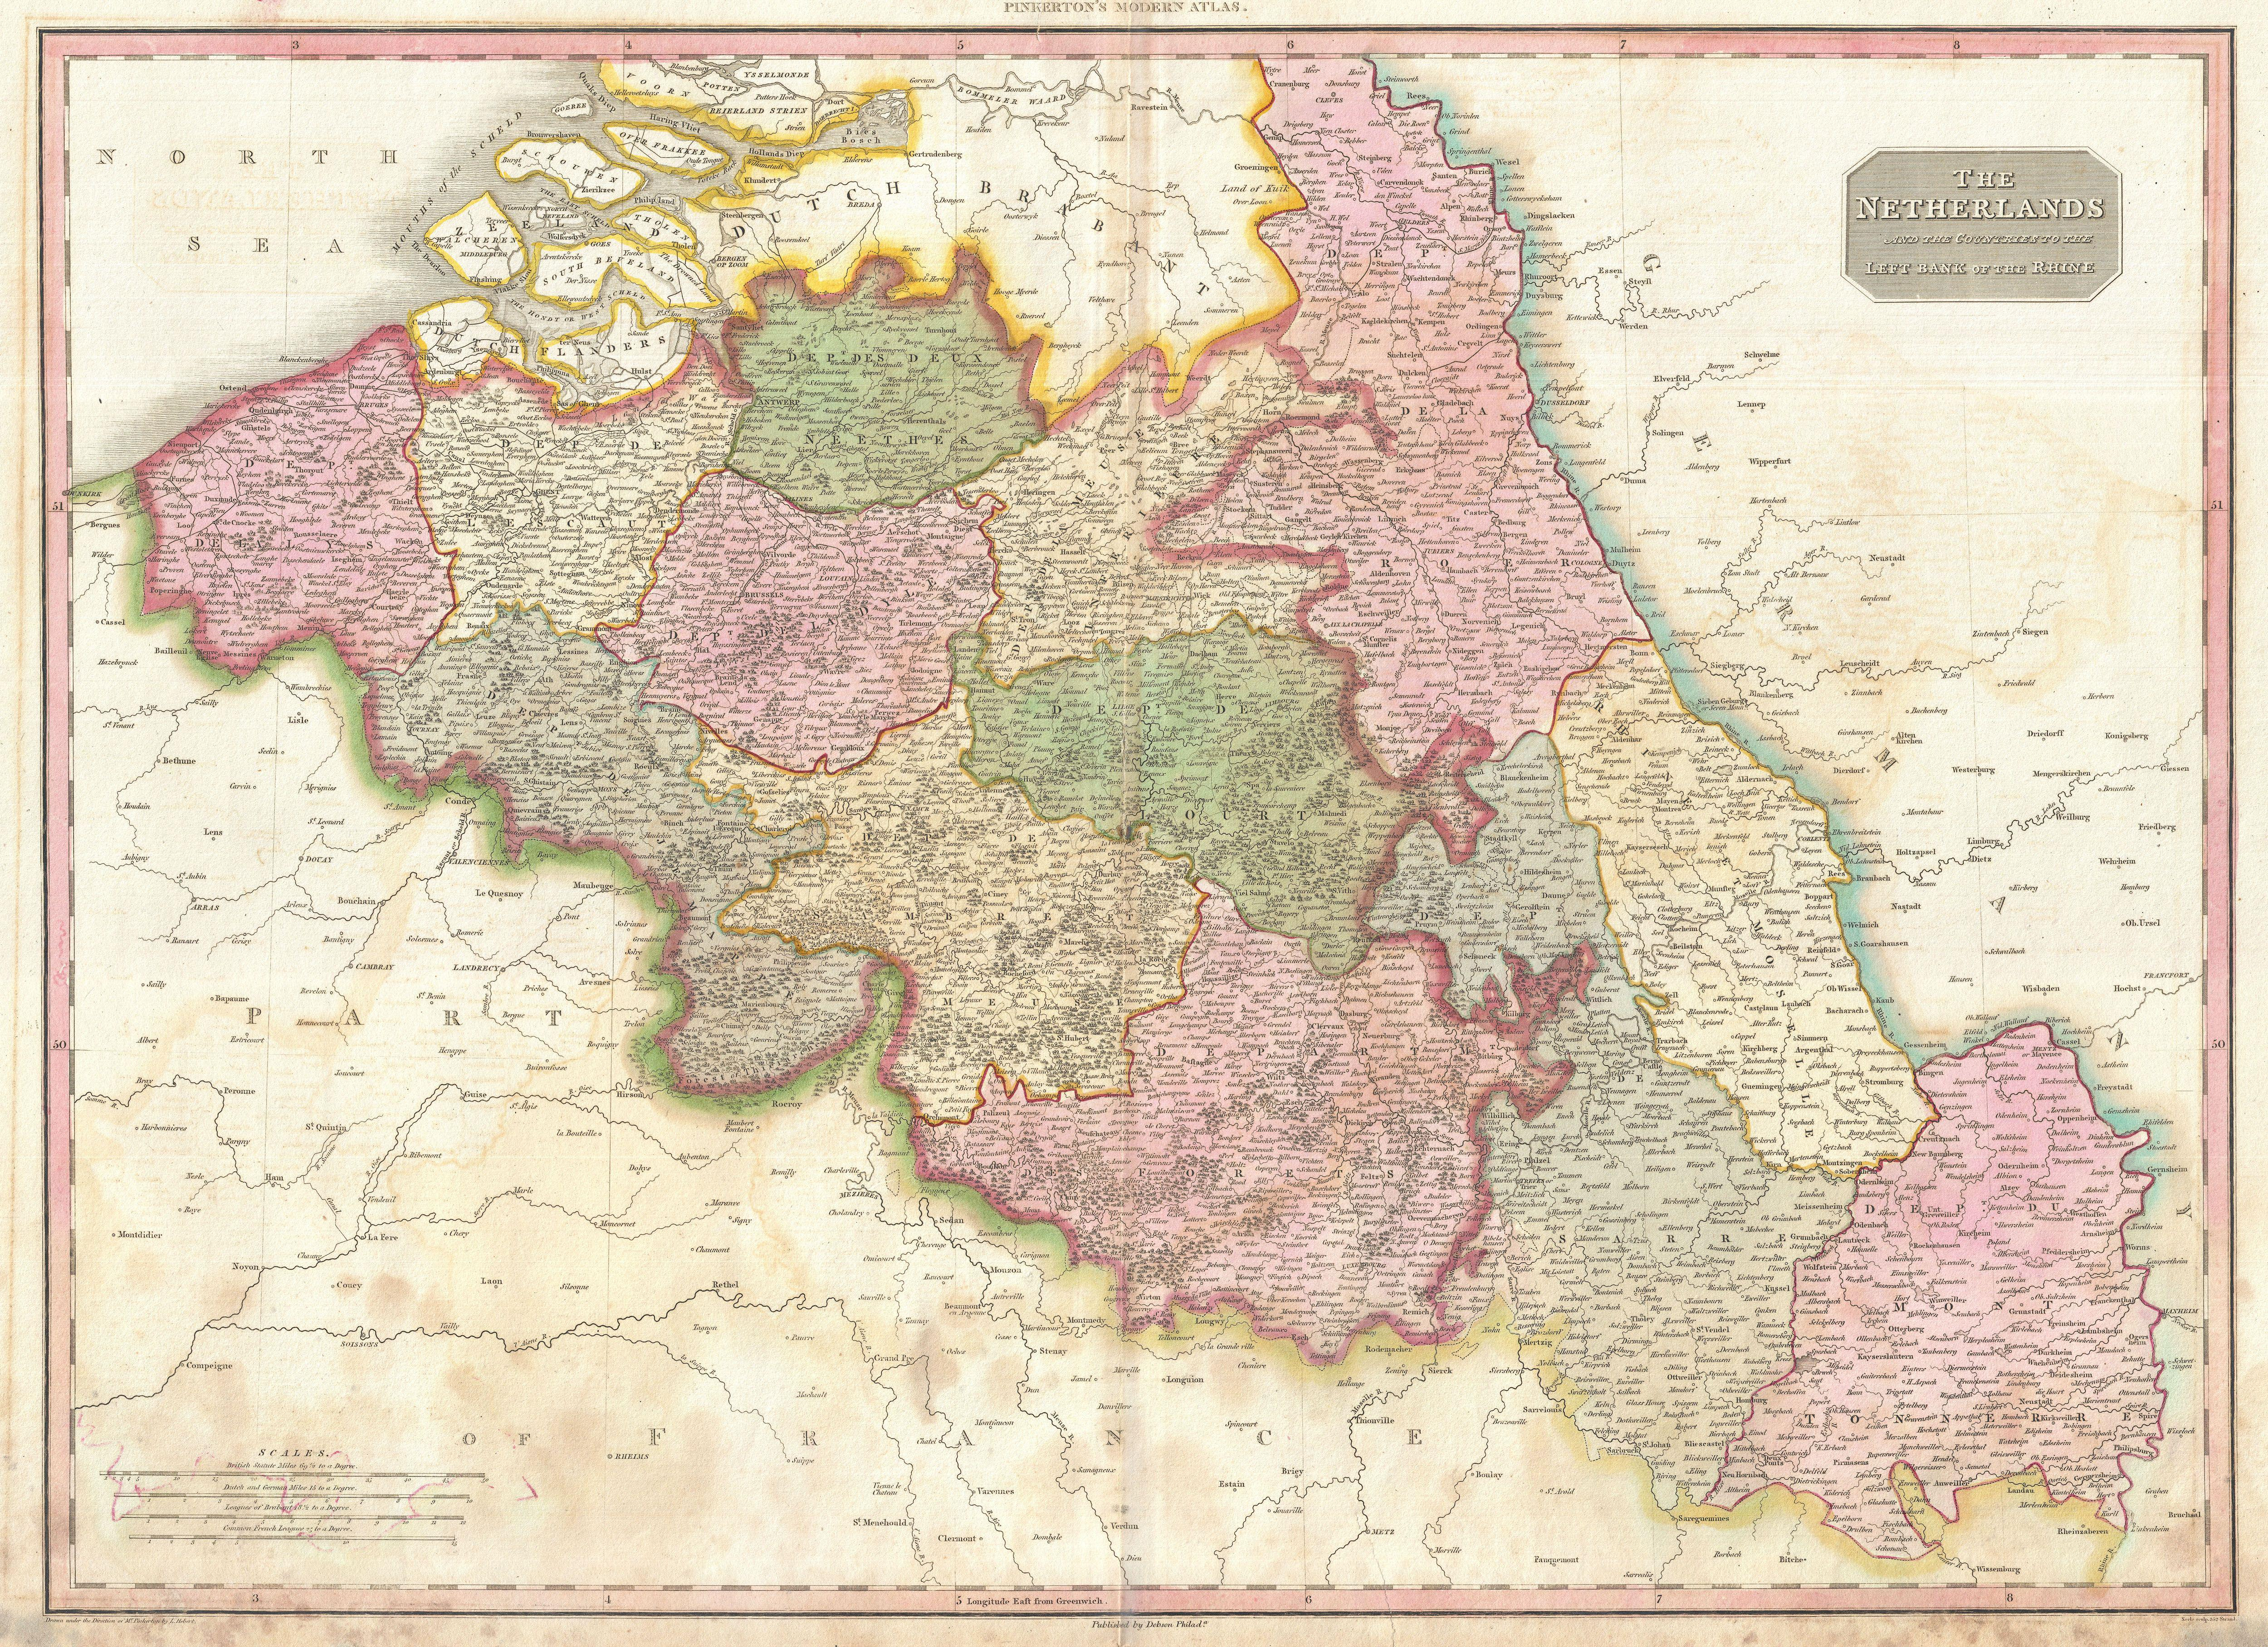 File:1818 Pinkerton Map of Beligum - Geographicus